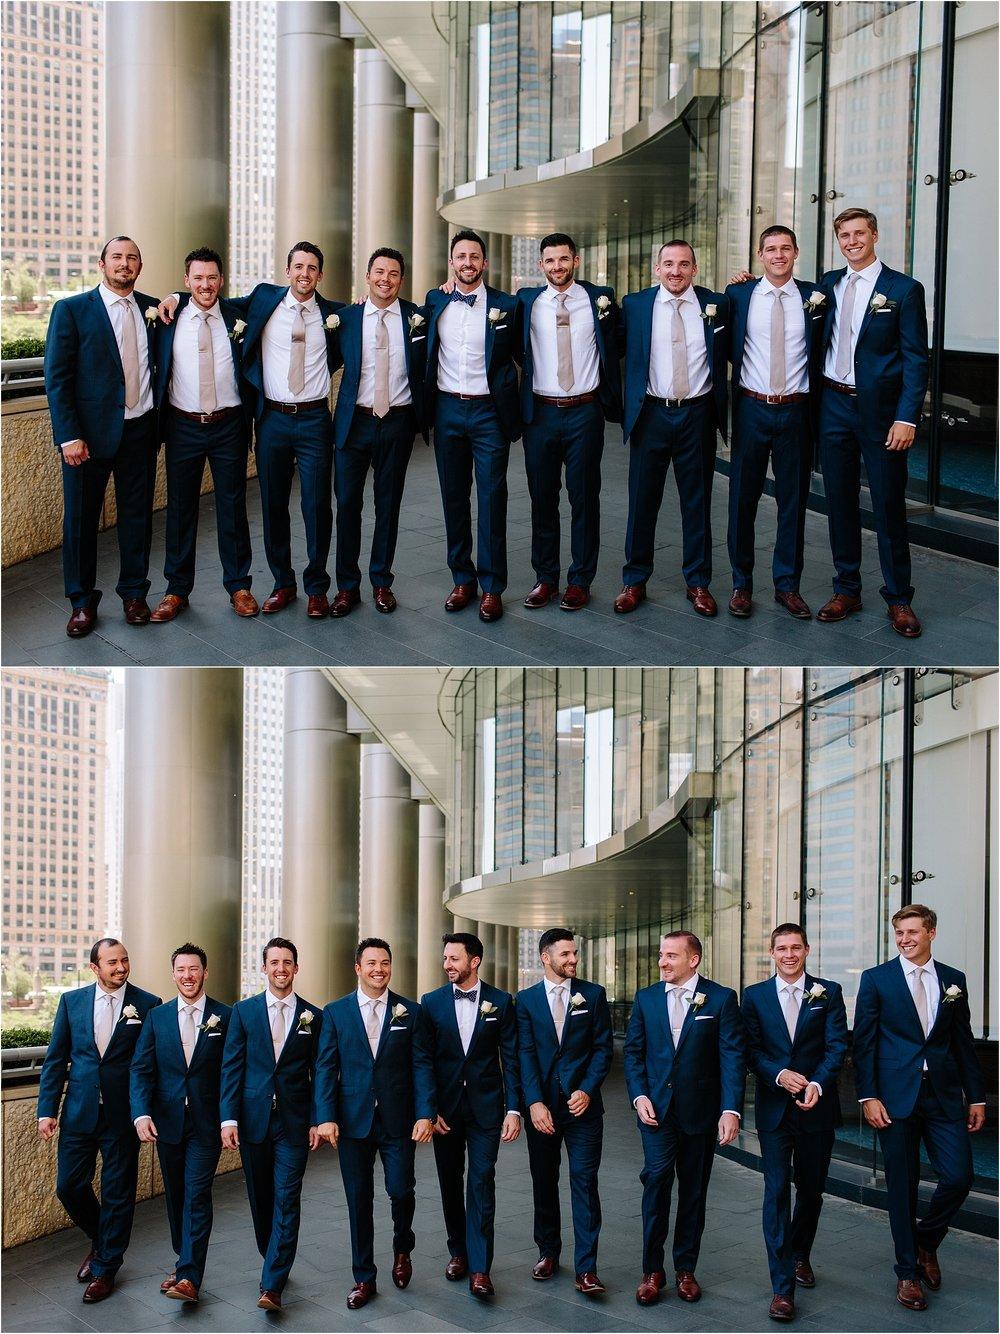 chicago-wedding-photographer-64.jpg